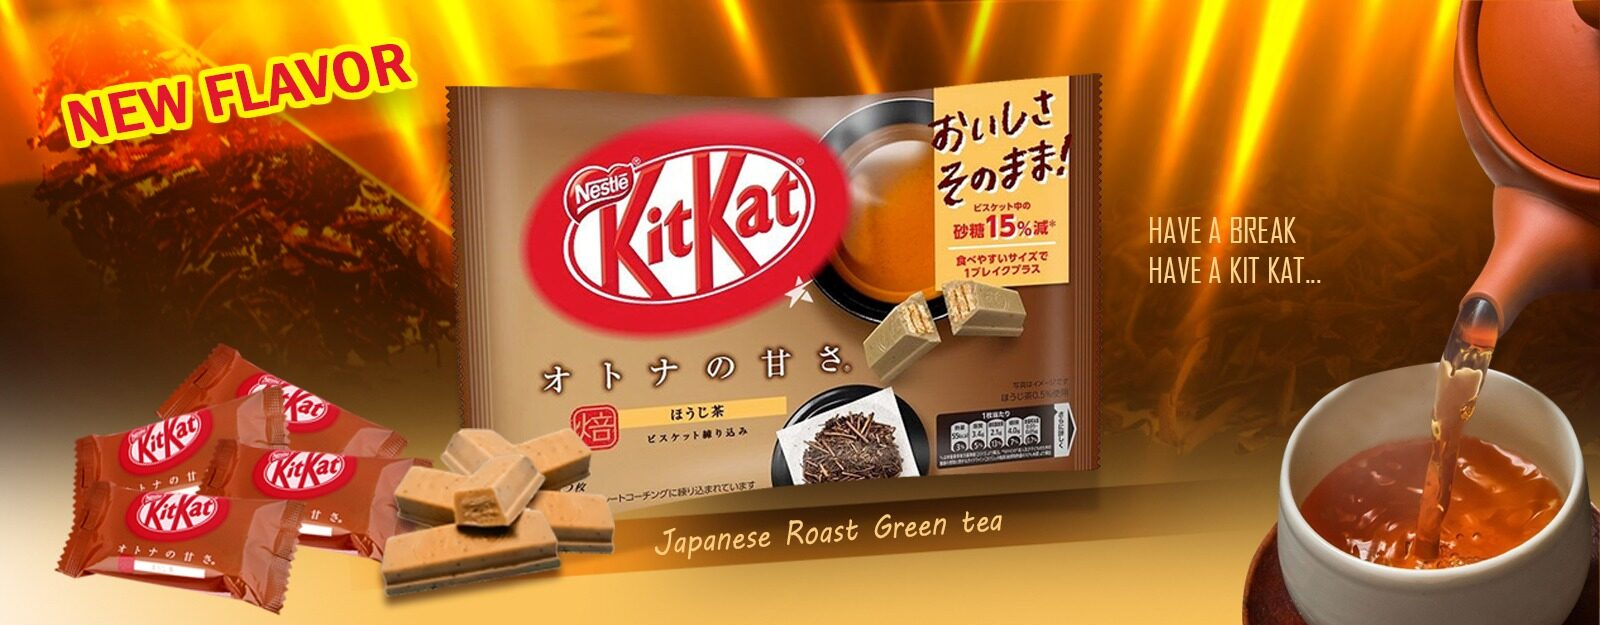 KitKat New Flavor!!!